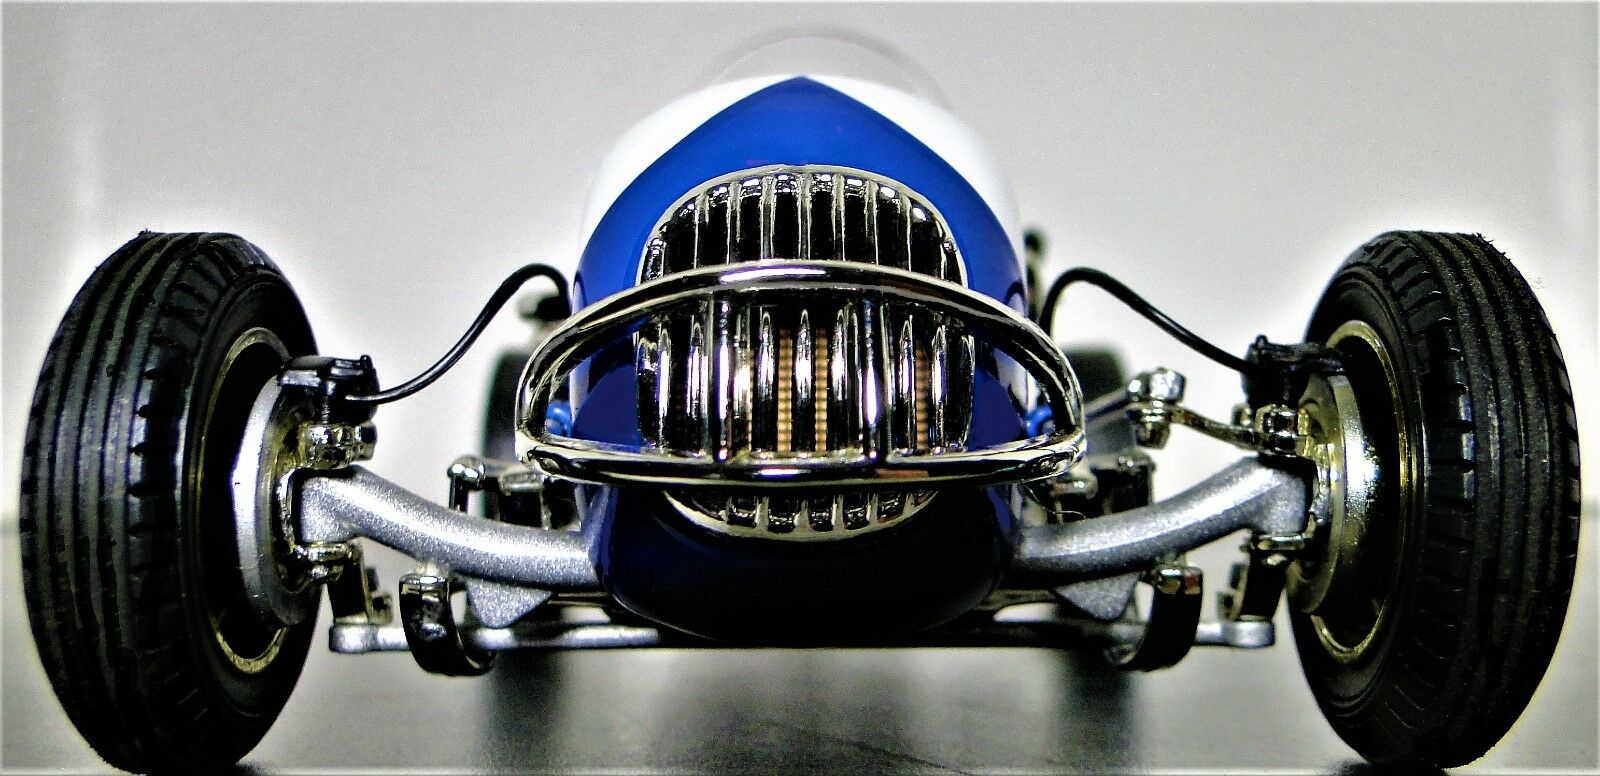 1 Race Car Ferrari 18 1960s 1960s 1960s 43 Vintage 24 Indy 64 Carousel bluee 12 F 9c4b05